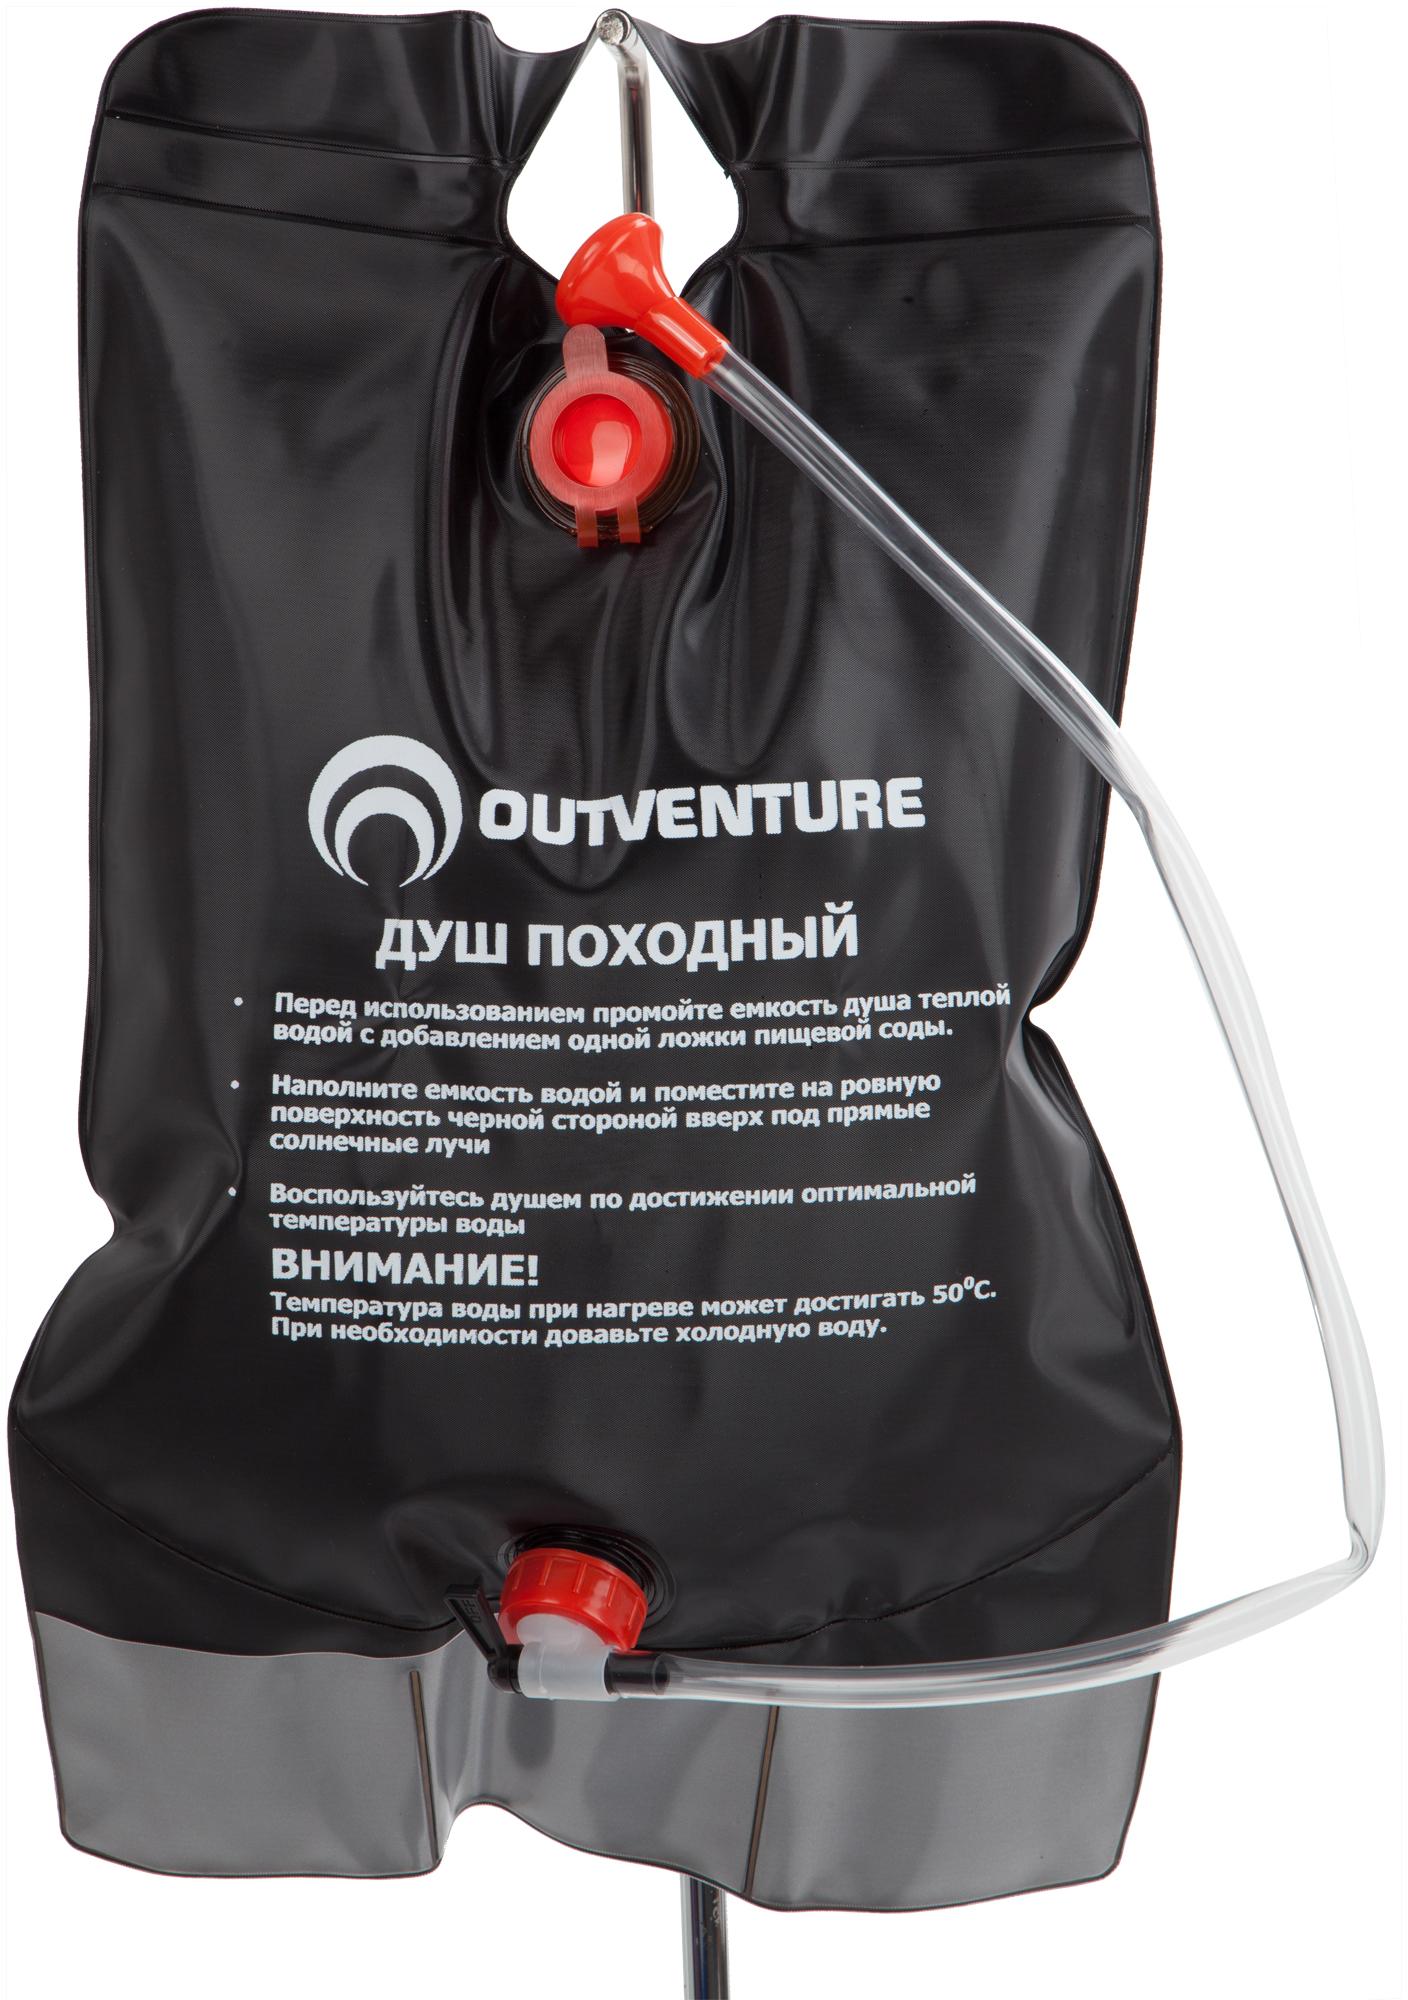 Outventure Душ походный Outventure, 10 л